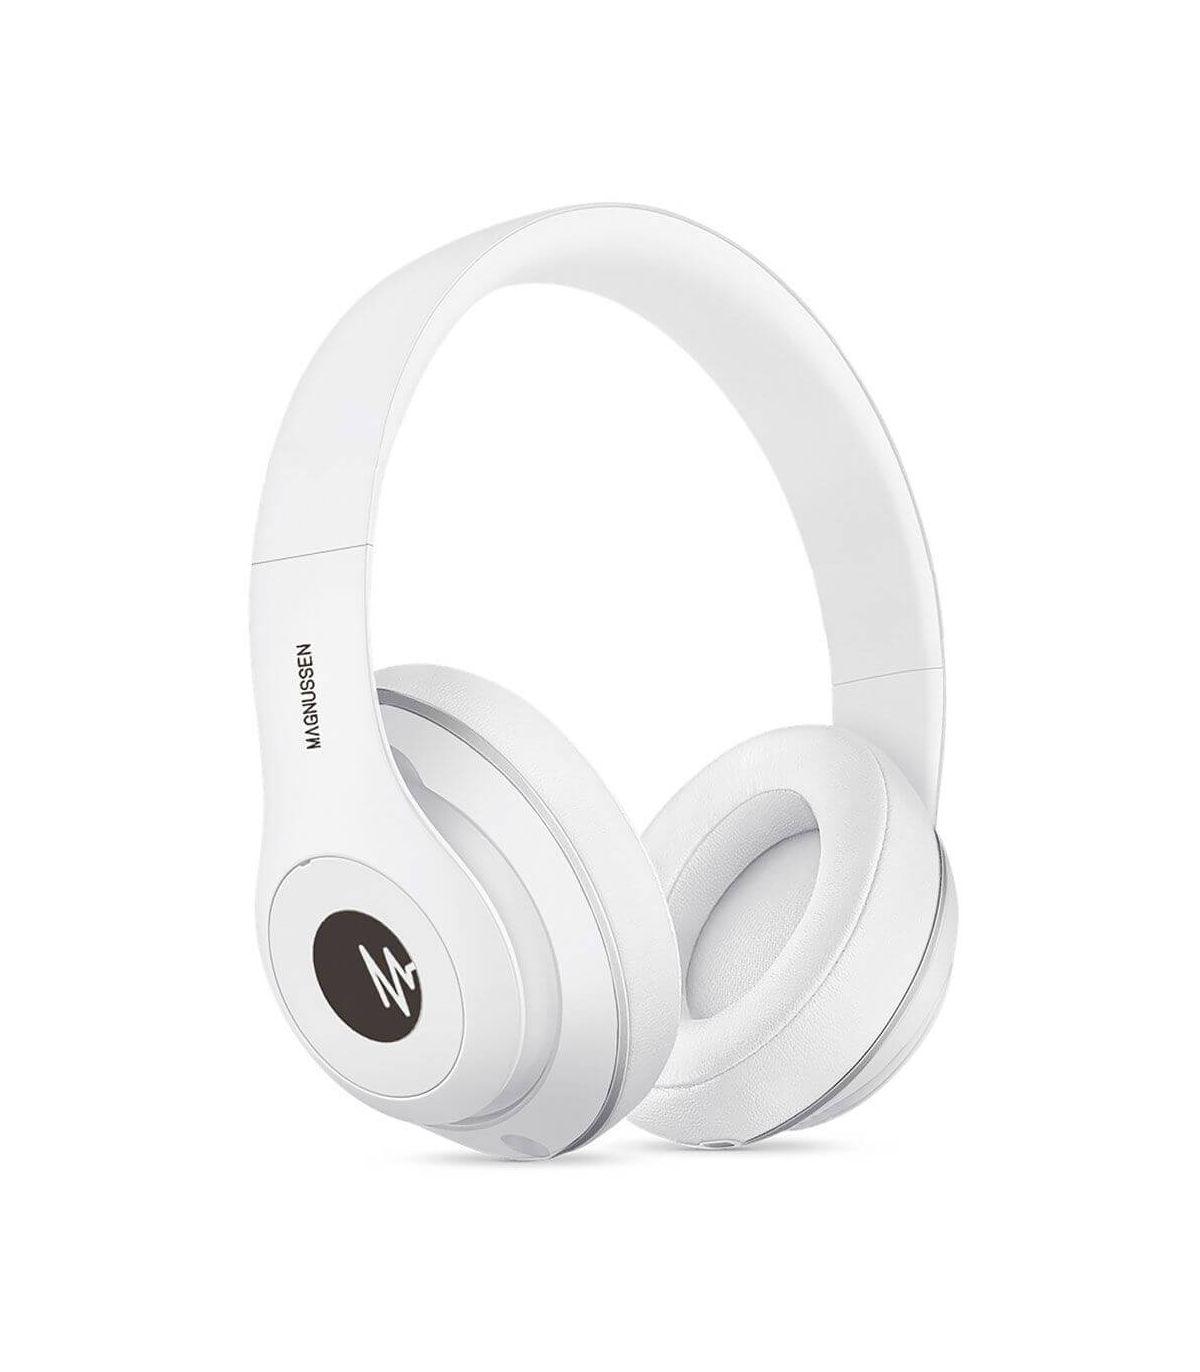 Magnussen Headphones H1 White Matte